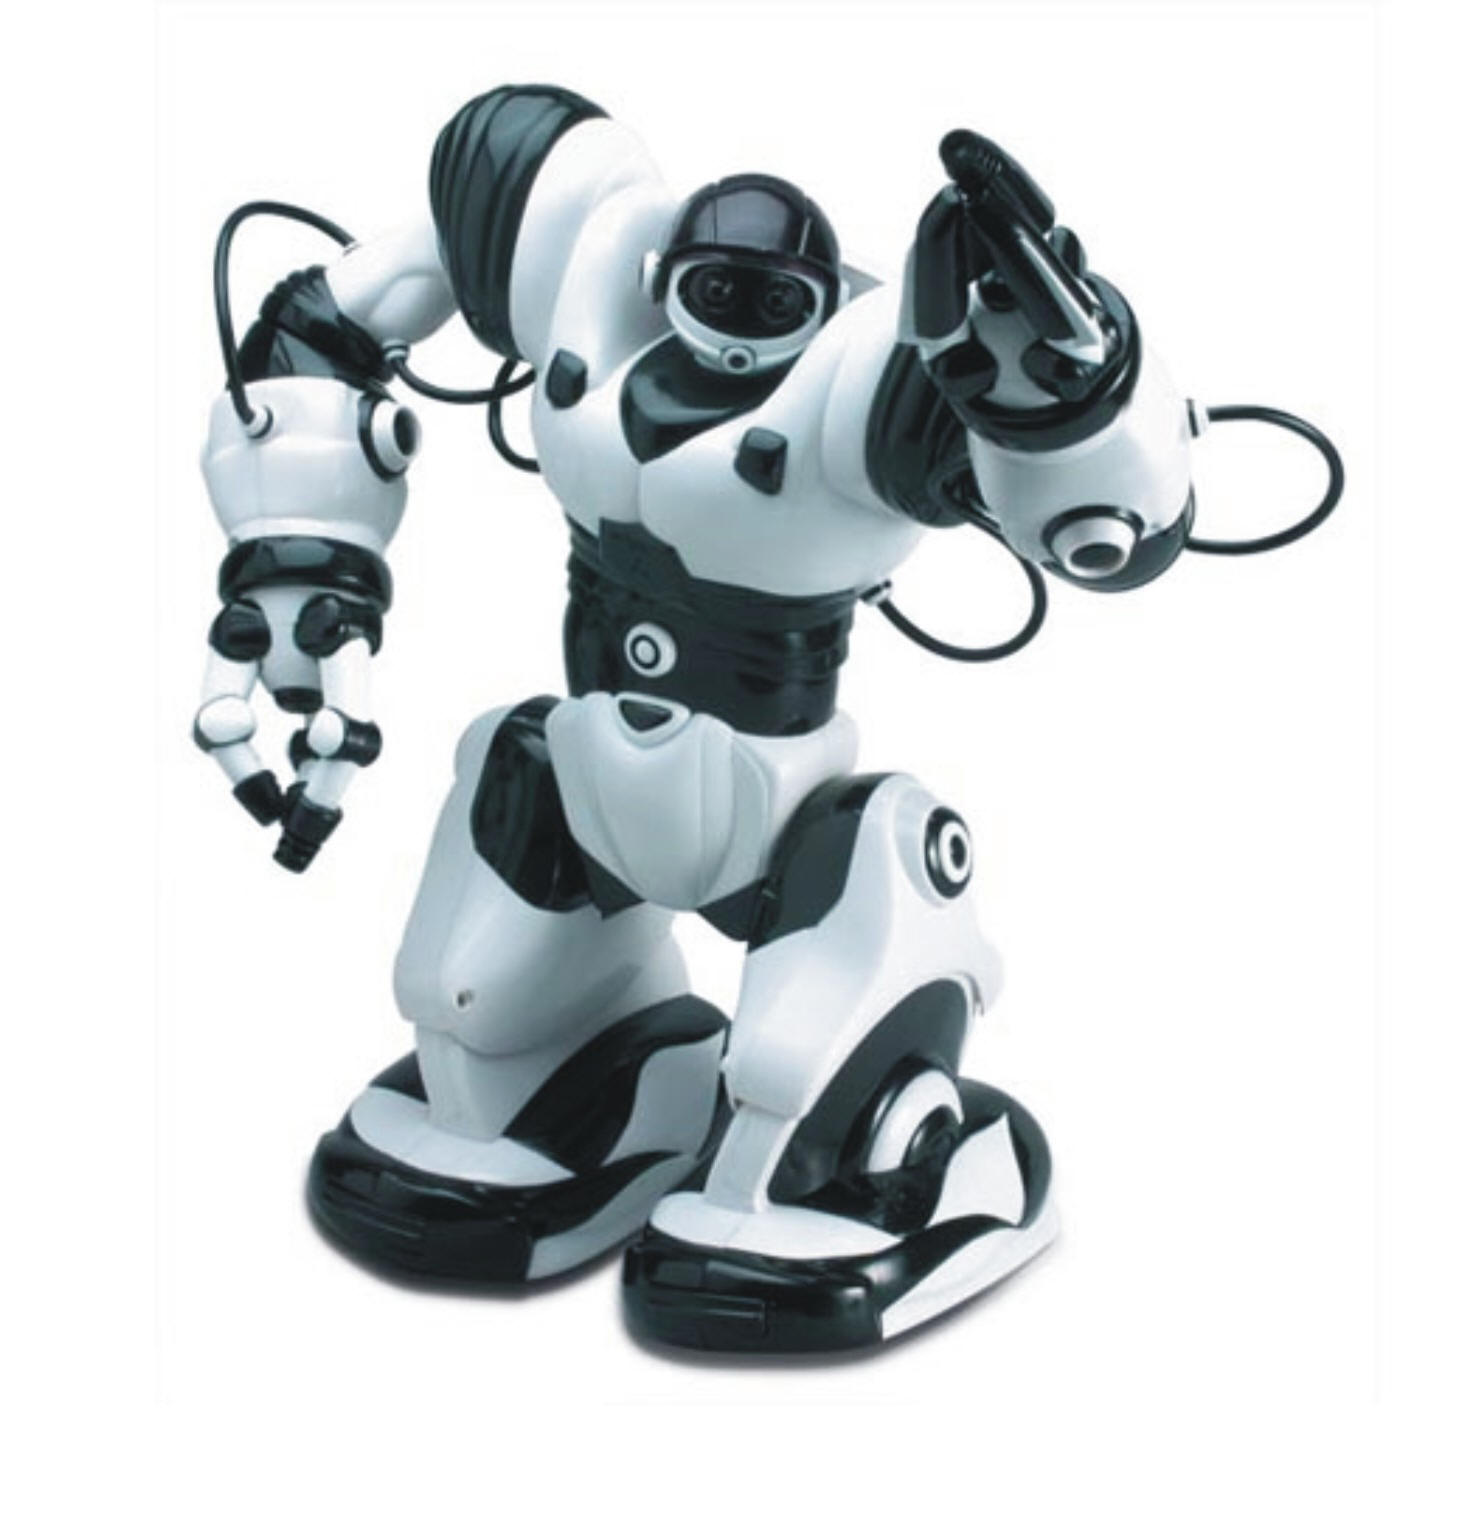 http://www2.vobs.at/ball-online/Topics/TOYS/toys_s8.jpg